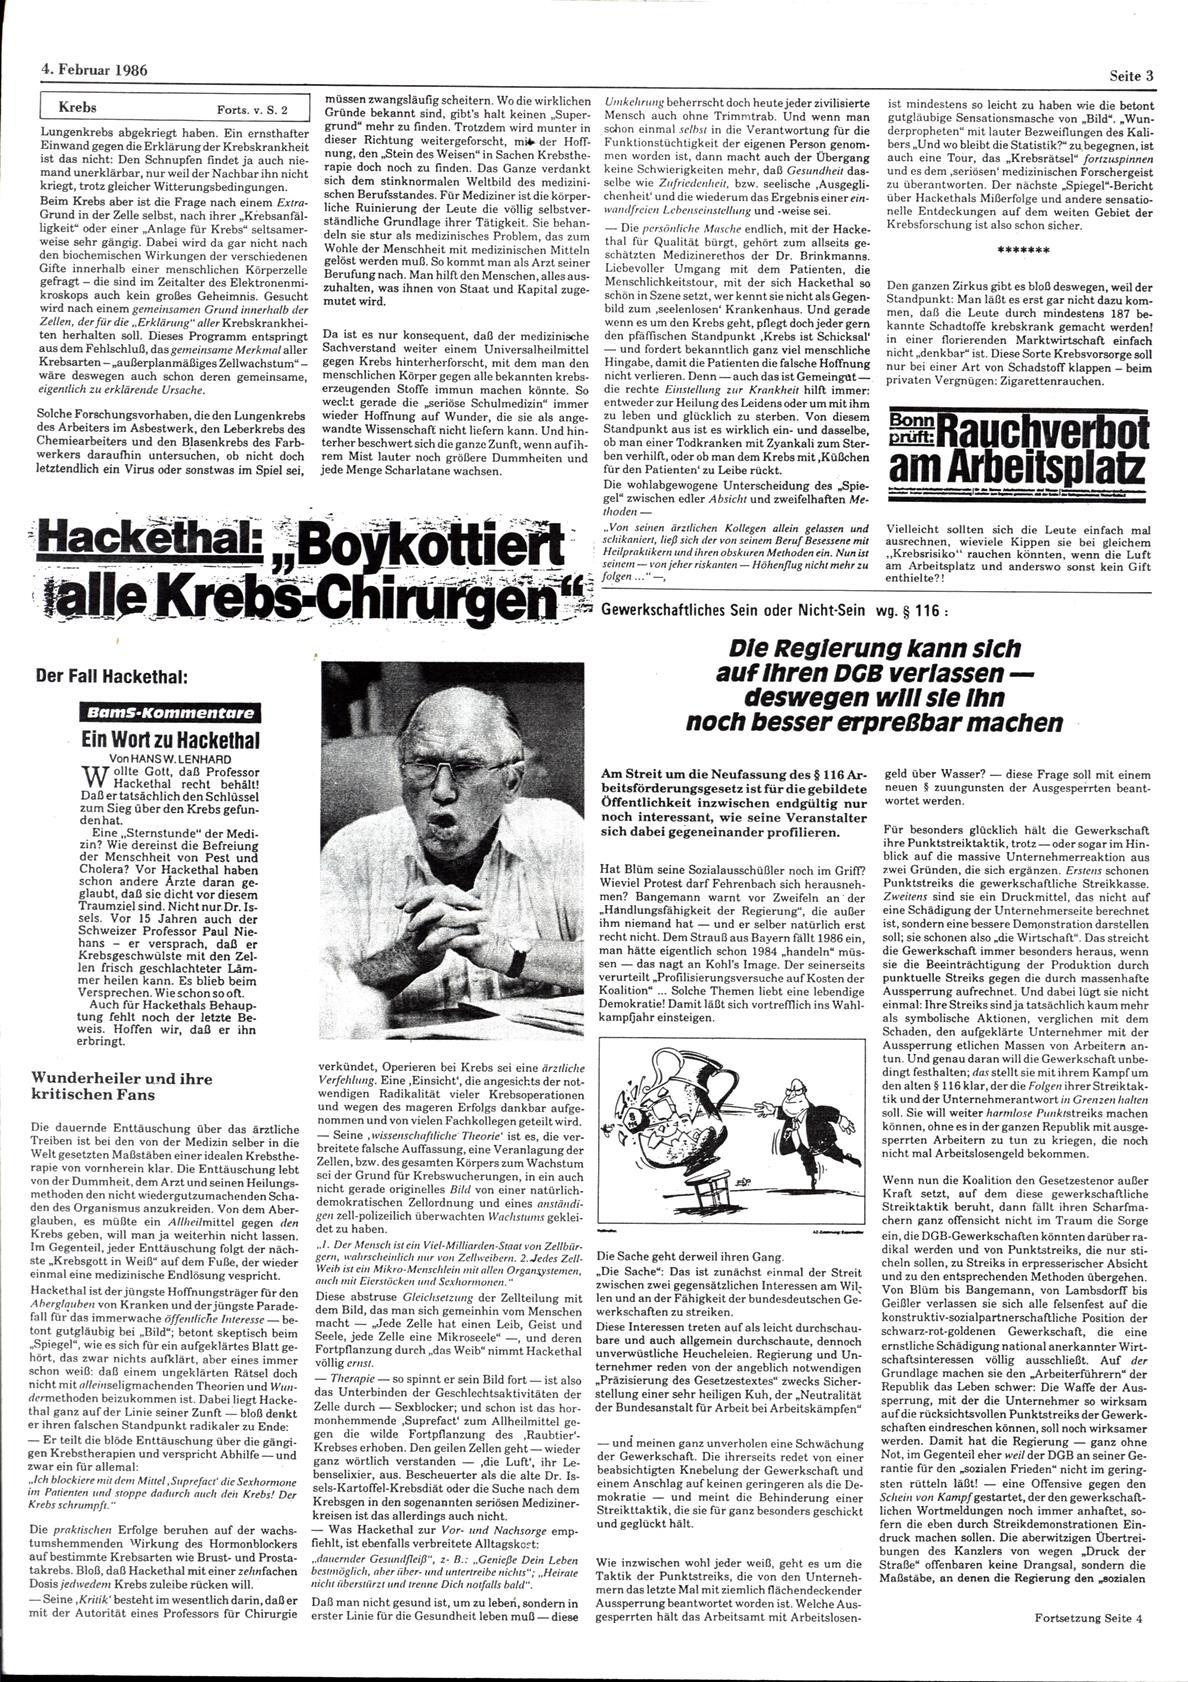 Bochum_BHZ_19860204_125_003